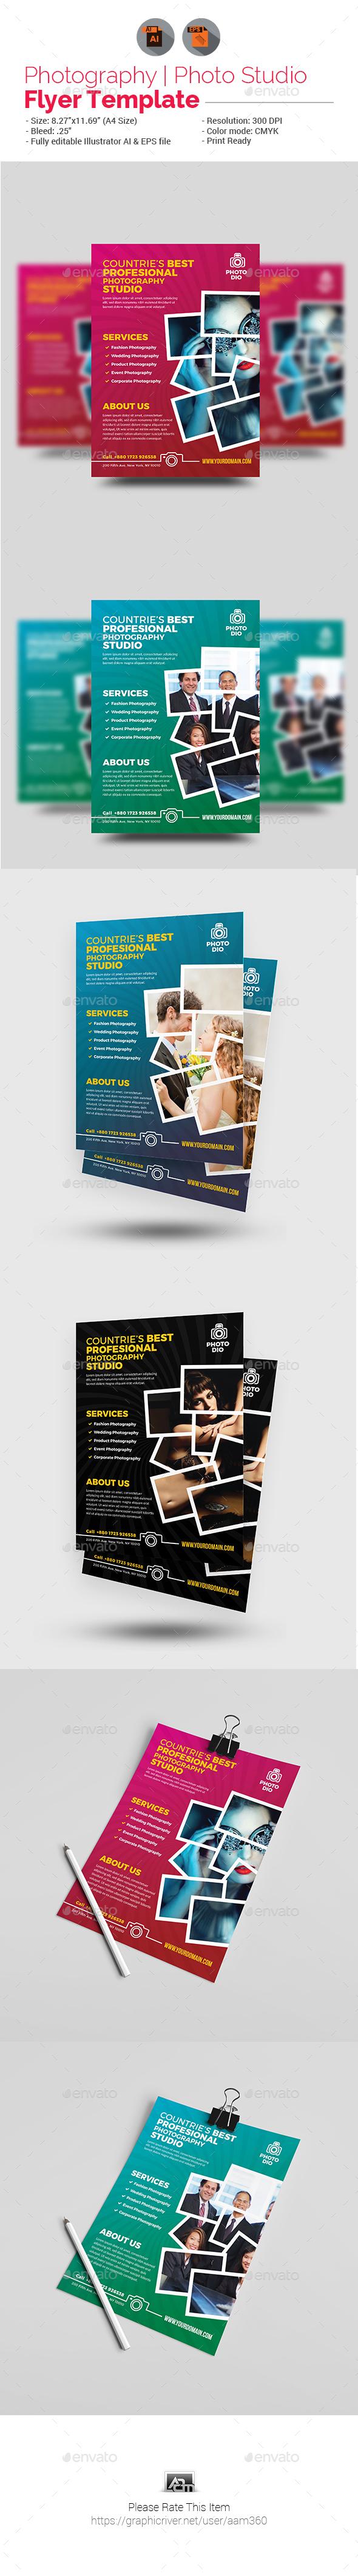 Photo Studio Flyer - Flyers Print Templates